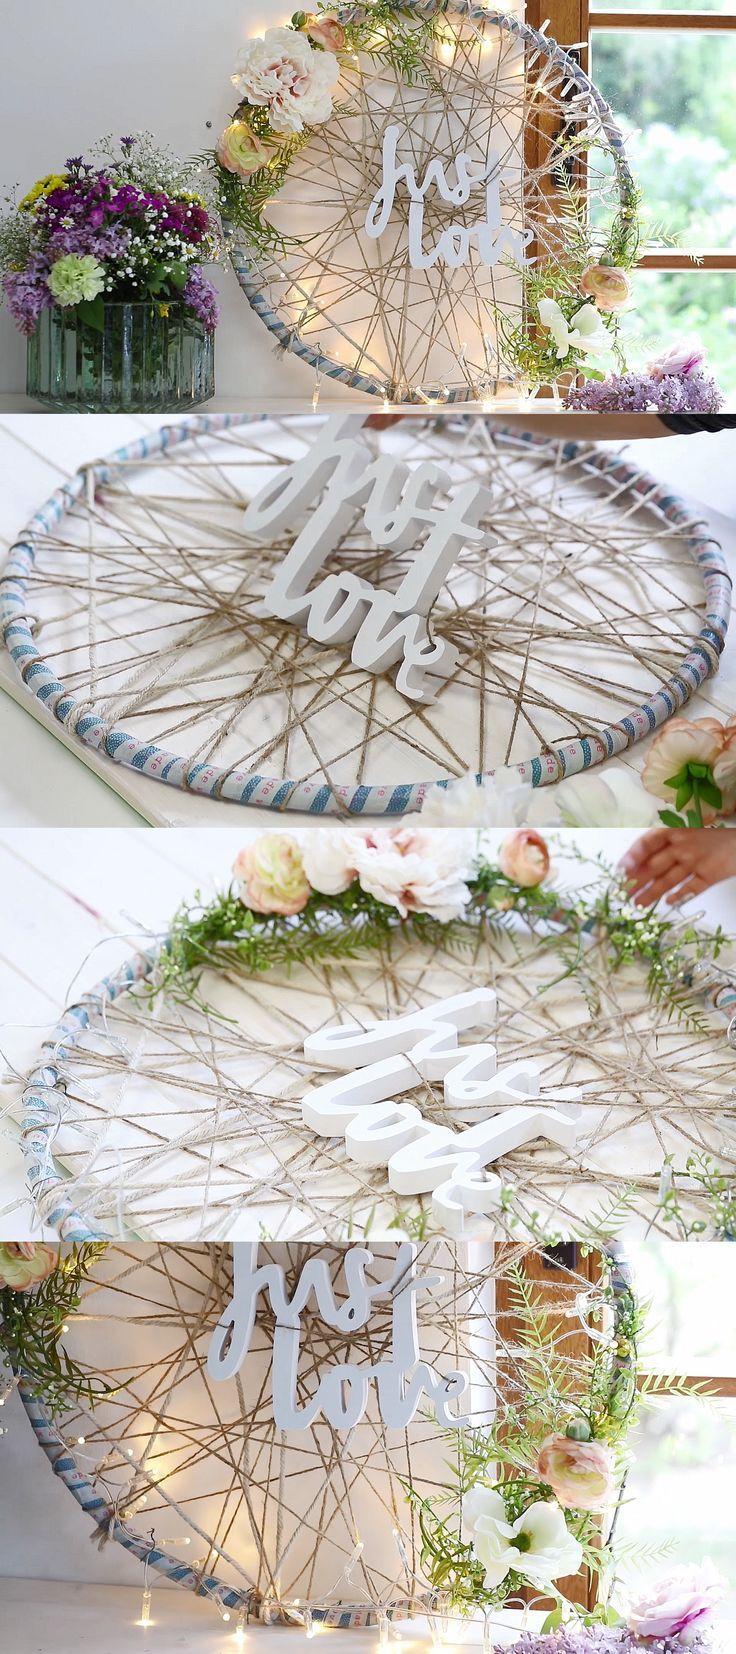 Hula Hoop Reifen Als Geniale Idee Fur Die Hochzeitsdeko Diy